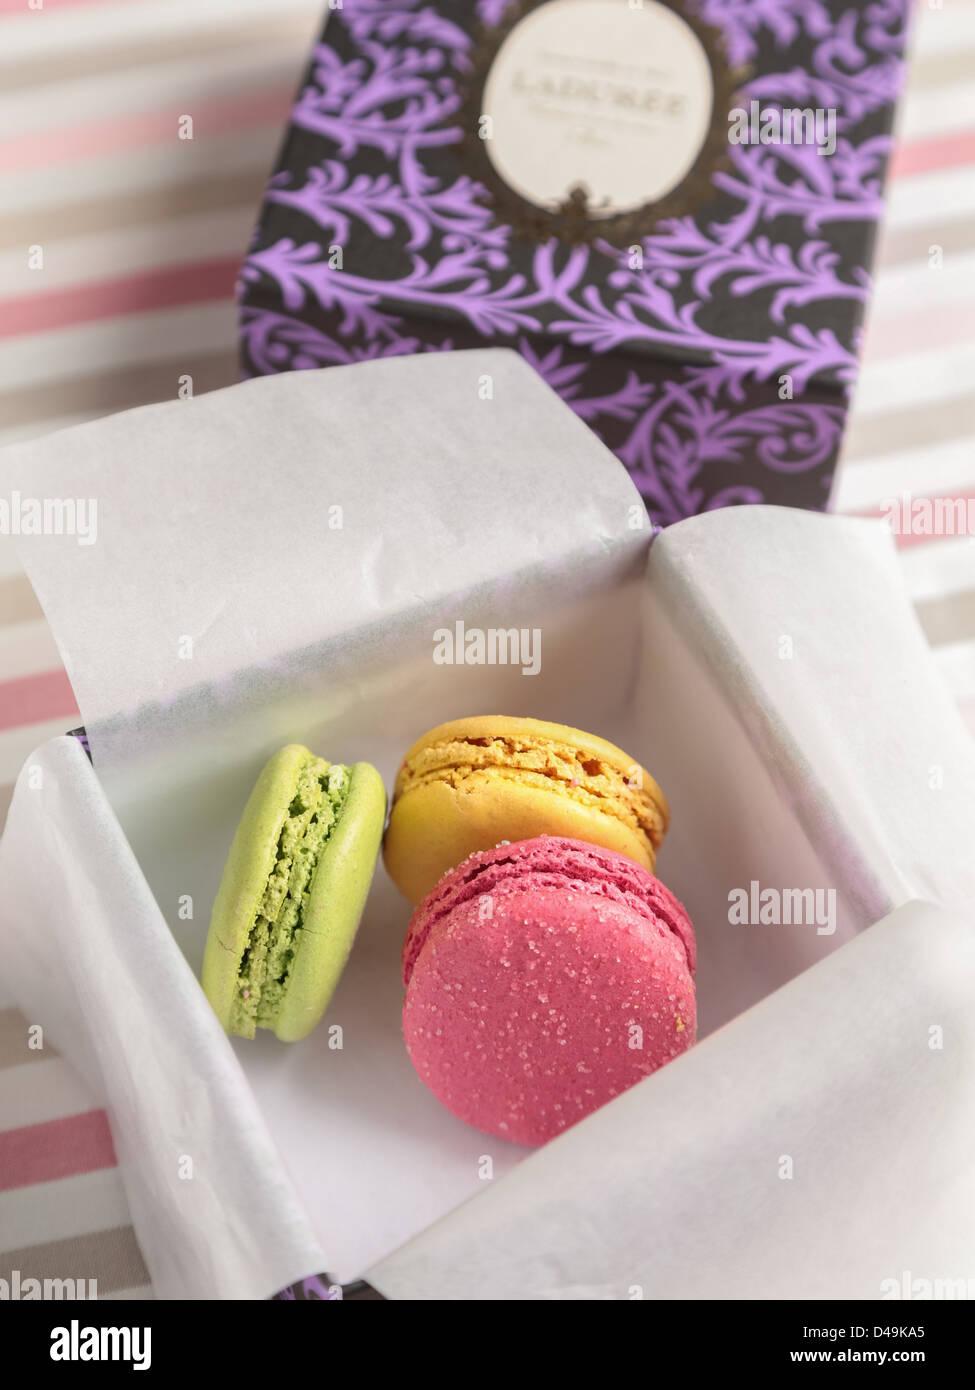 Box of Laduree Macaron - Stock Image